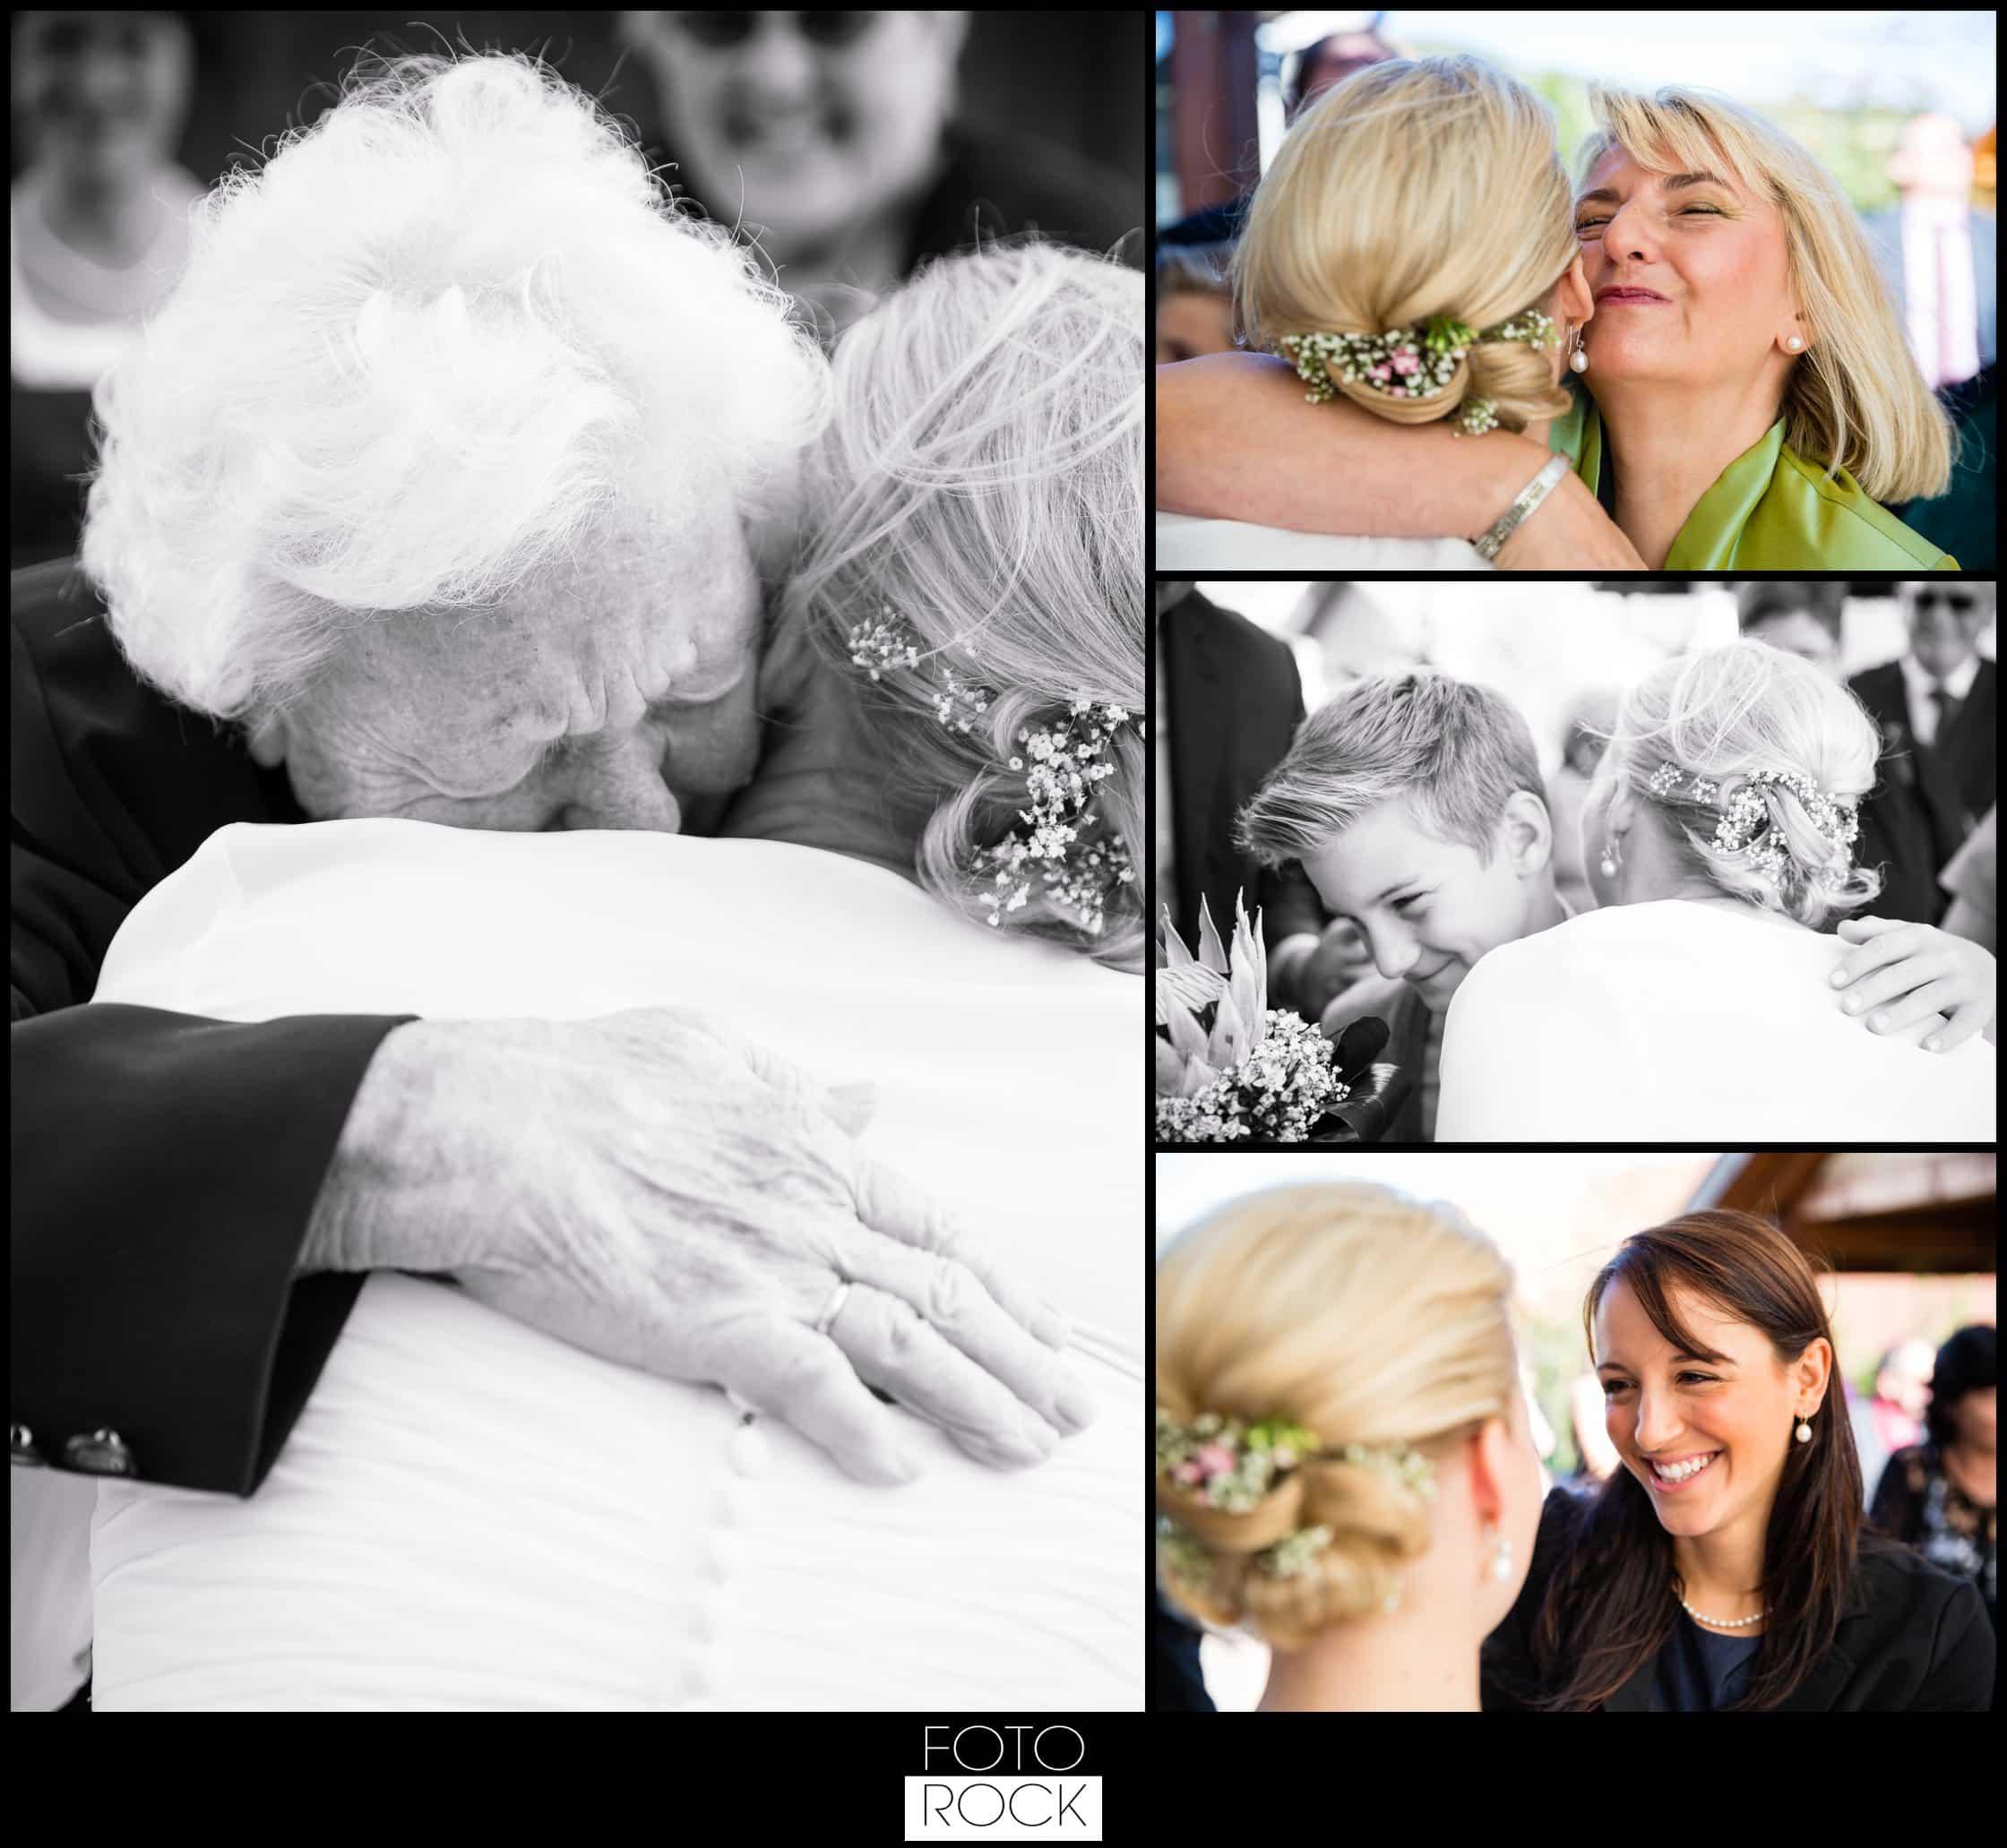 Hochzeit Adler Haeusern gratulation umarmung